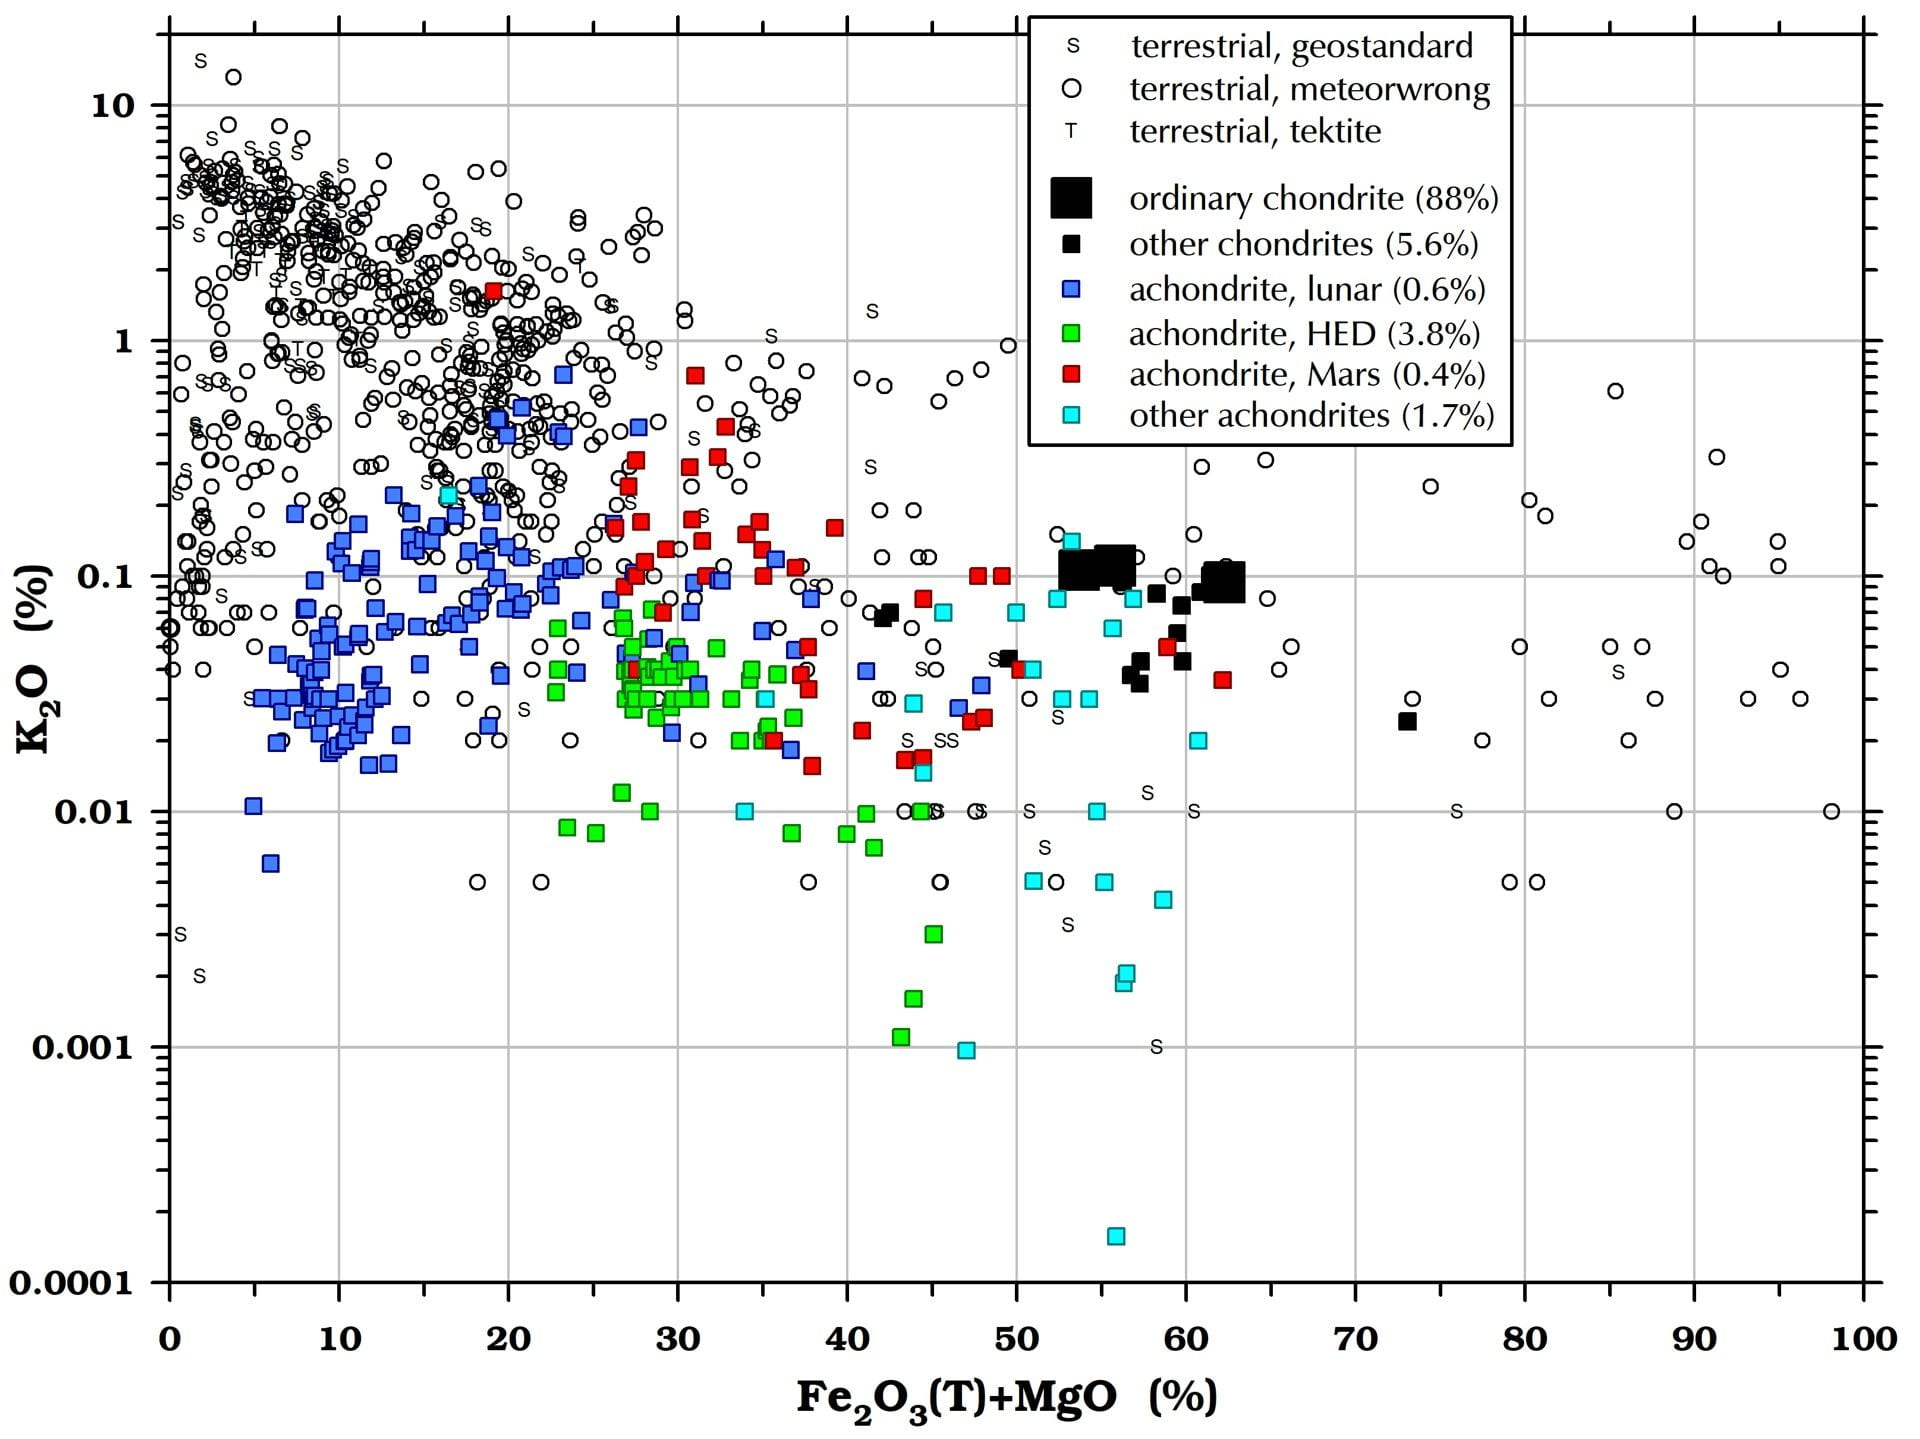 Potassium(K2O) in meteorites and terrestrial rocks